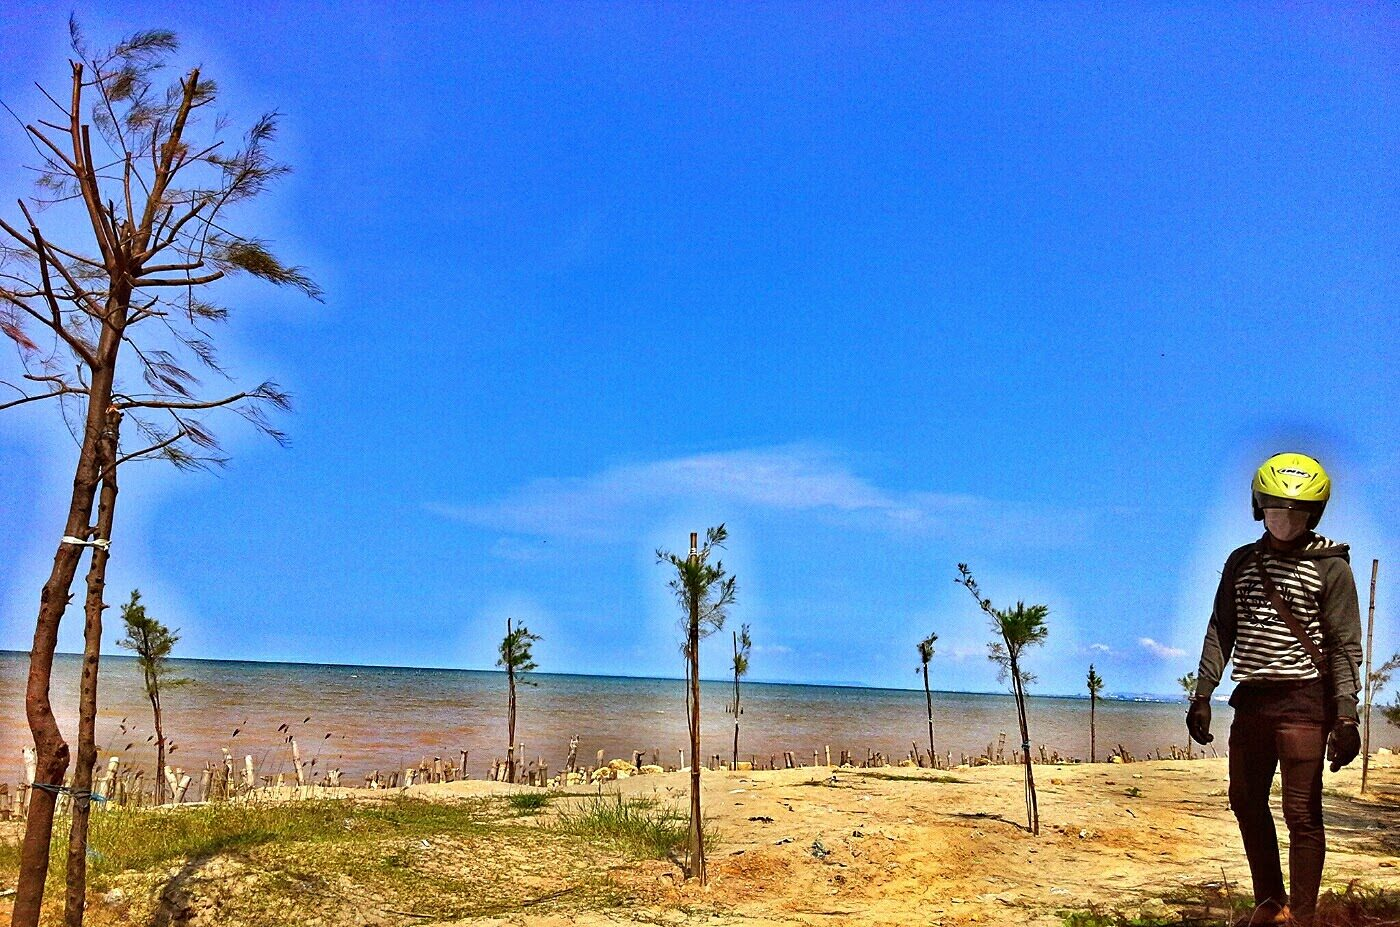 Keindahan Wisata Alam Mangrove Center Tuban Tempat Memiliki Memukau Terletak